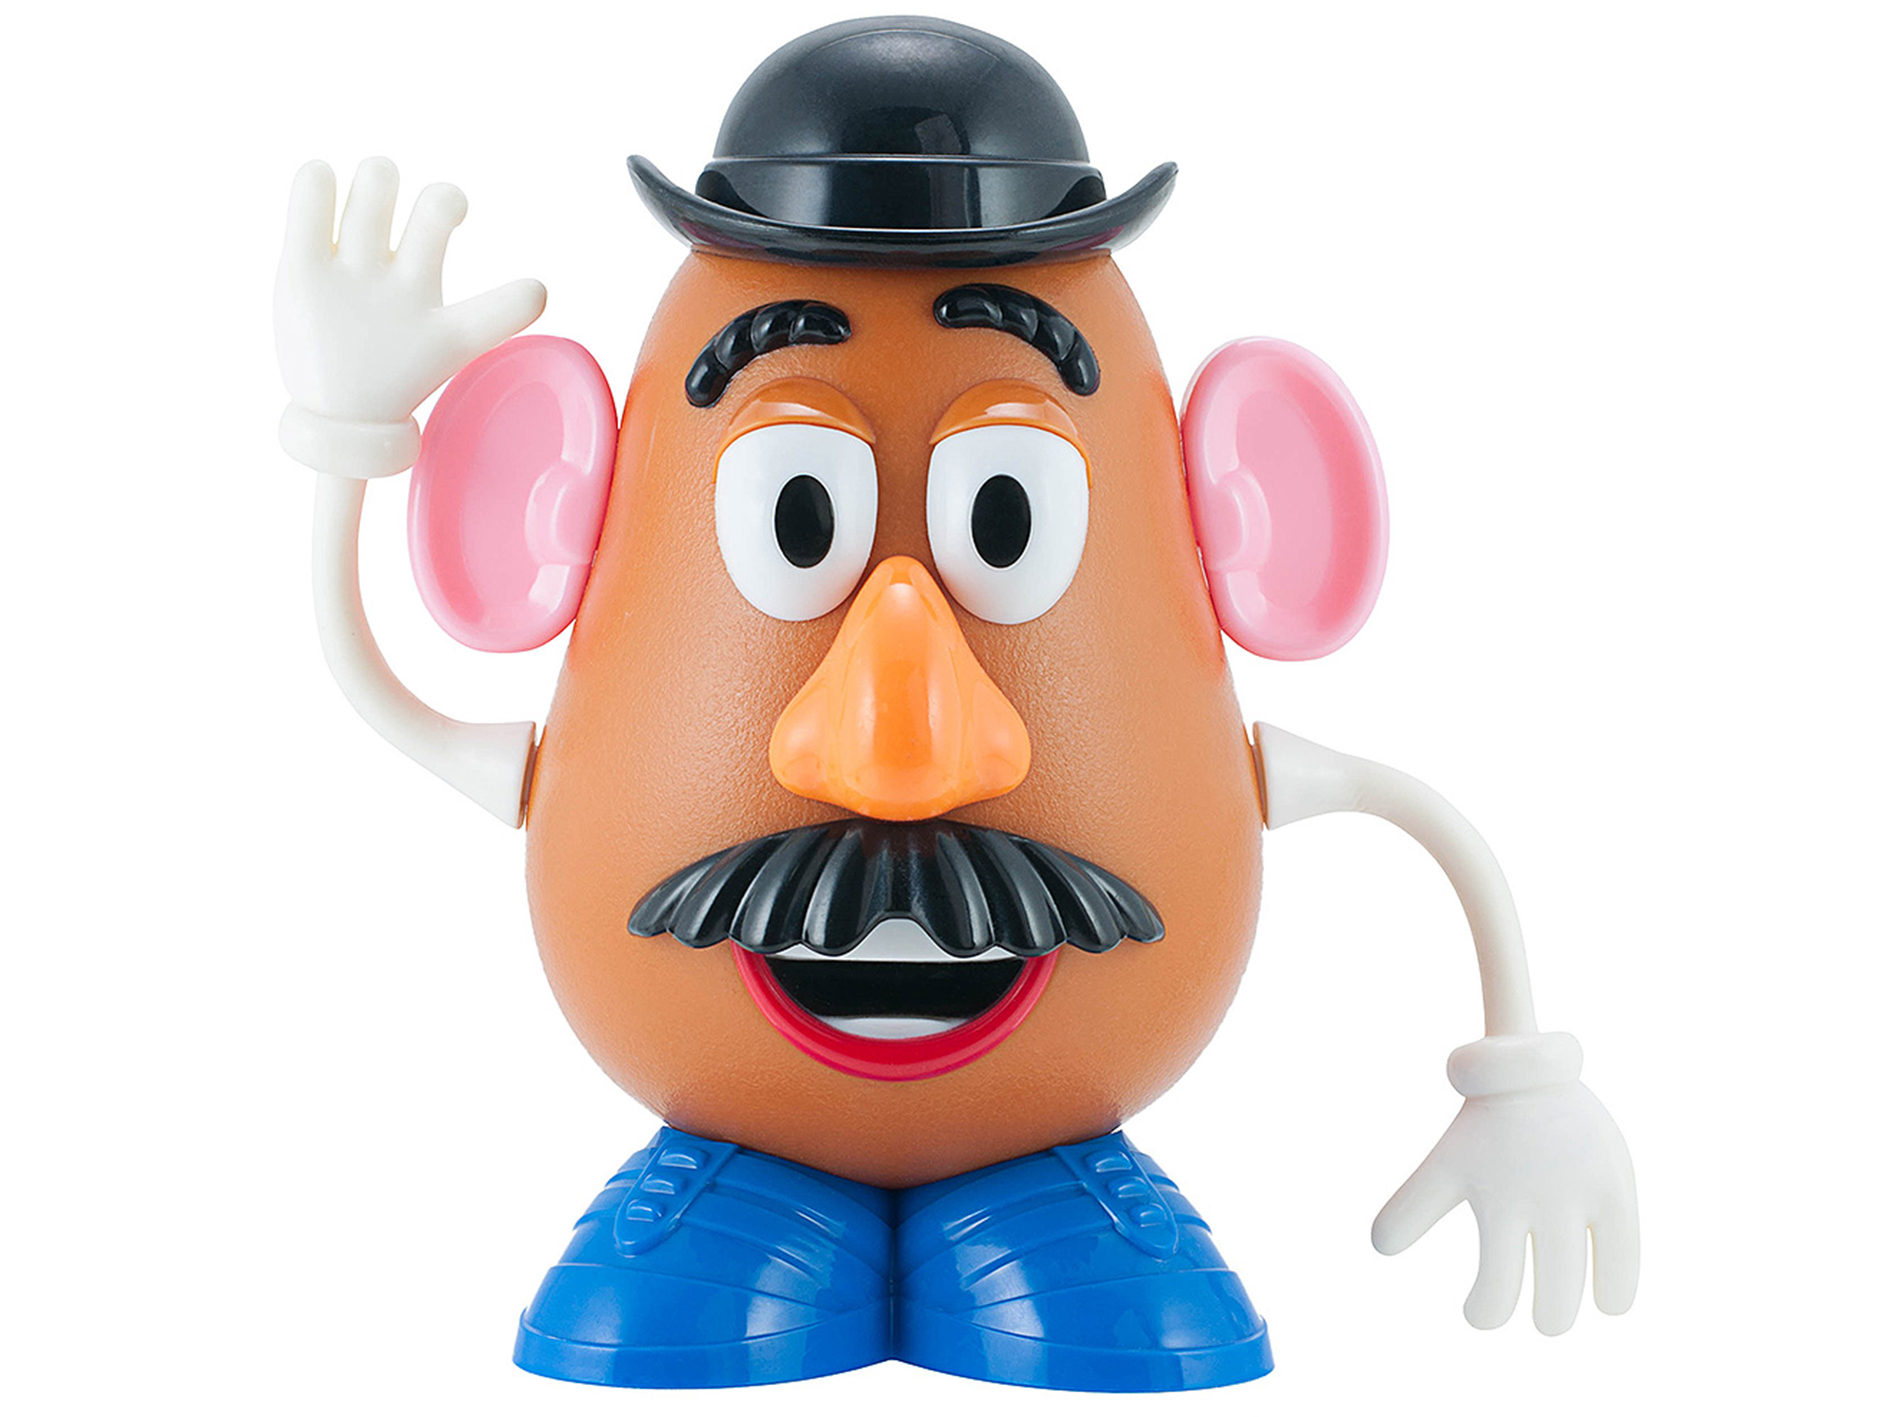 MrPotatoHead Mr Potato Head Introduces New Gender-Neutral Range